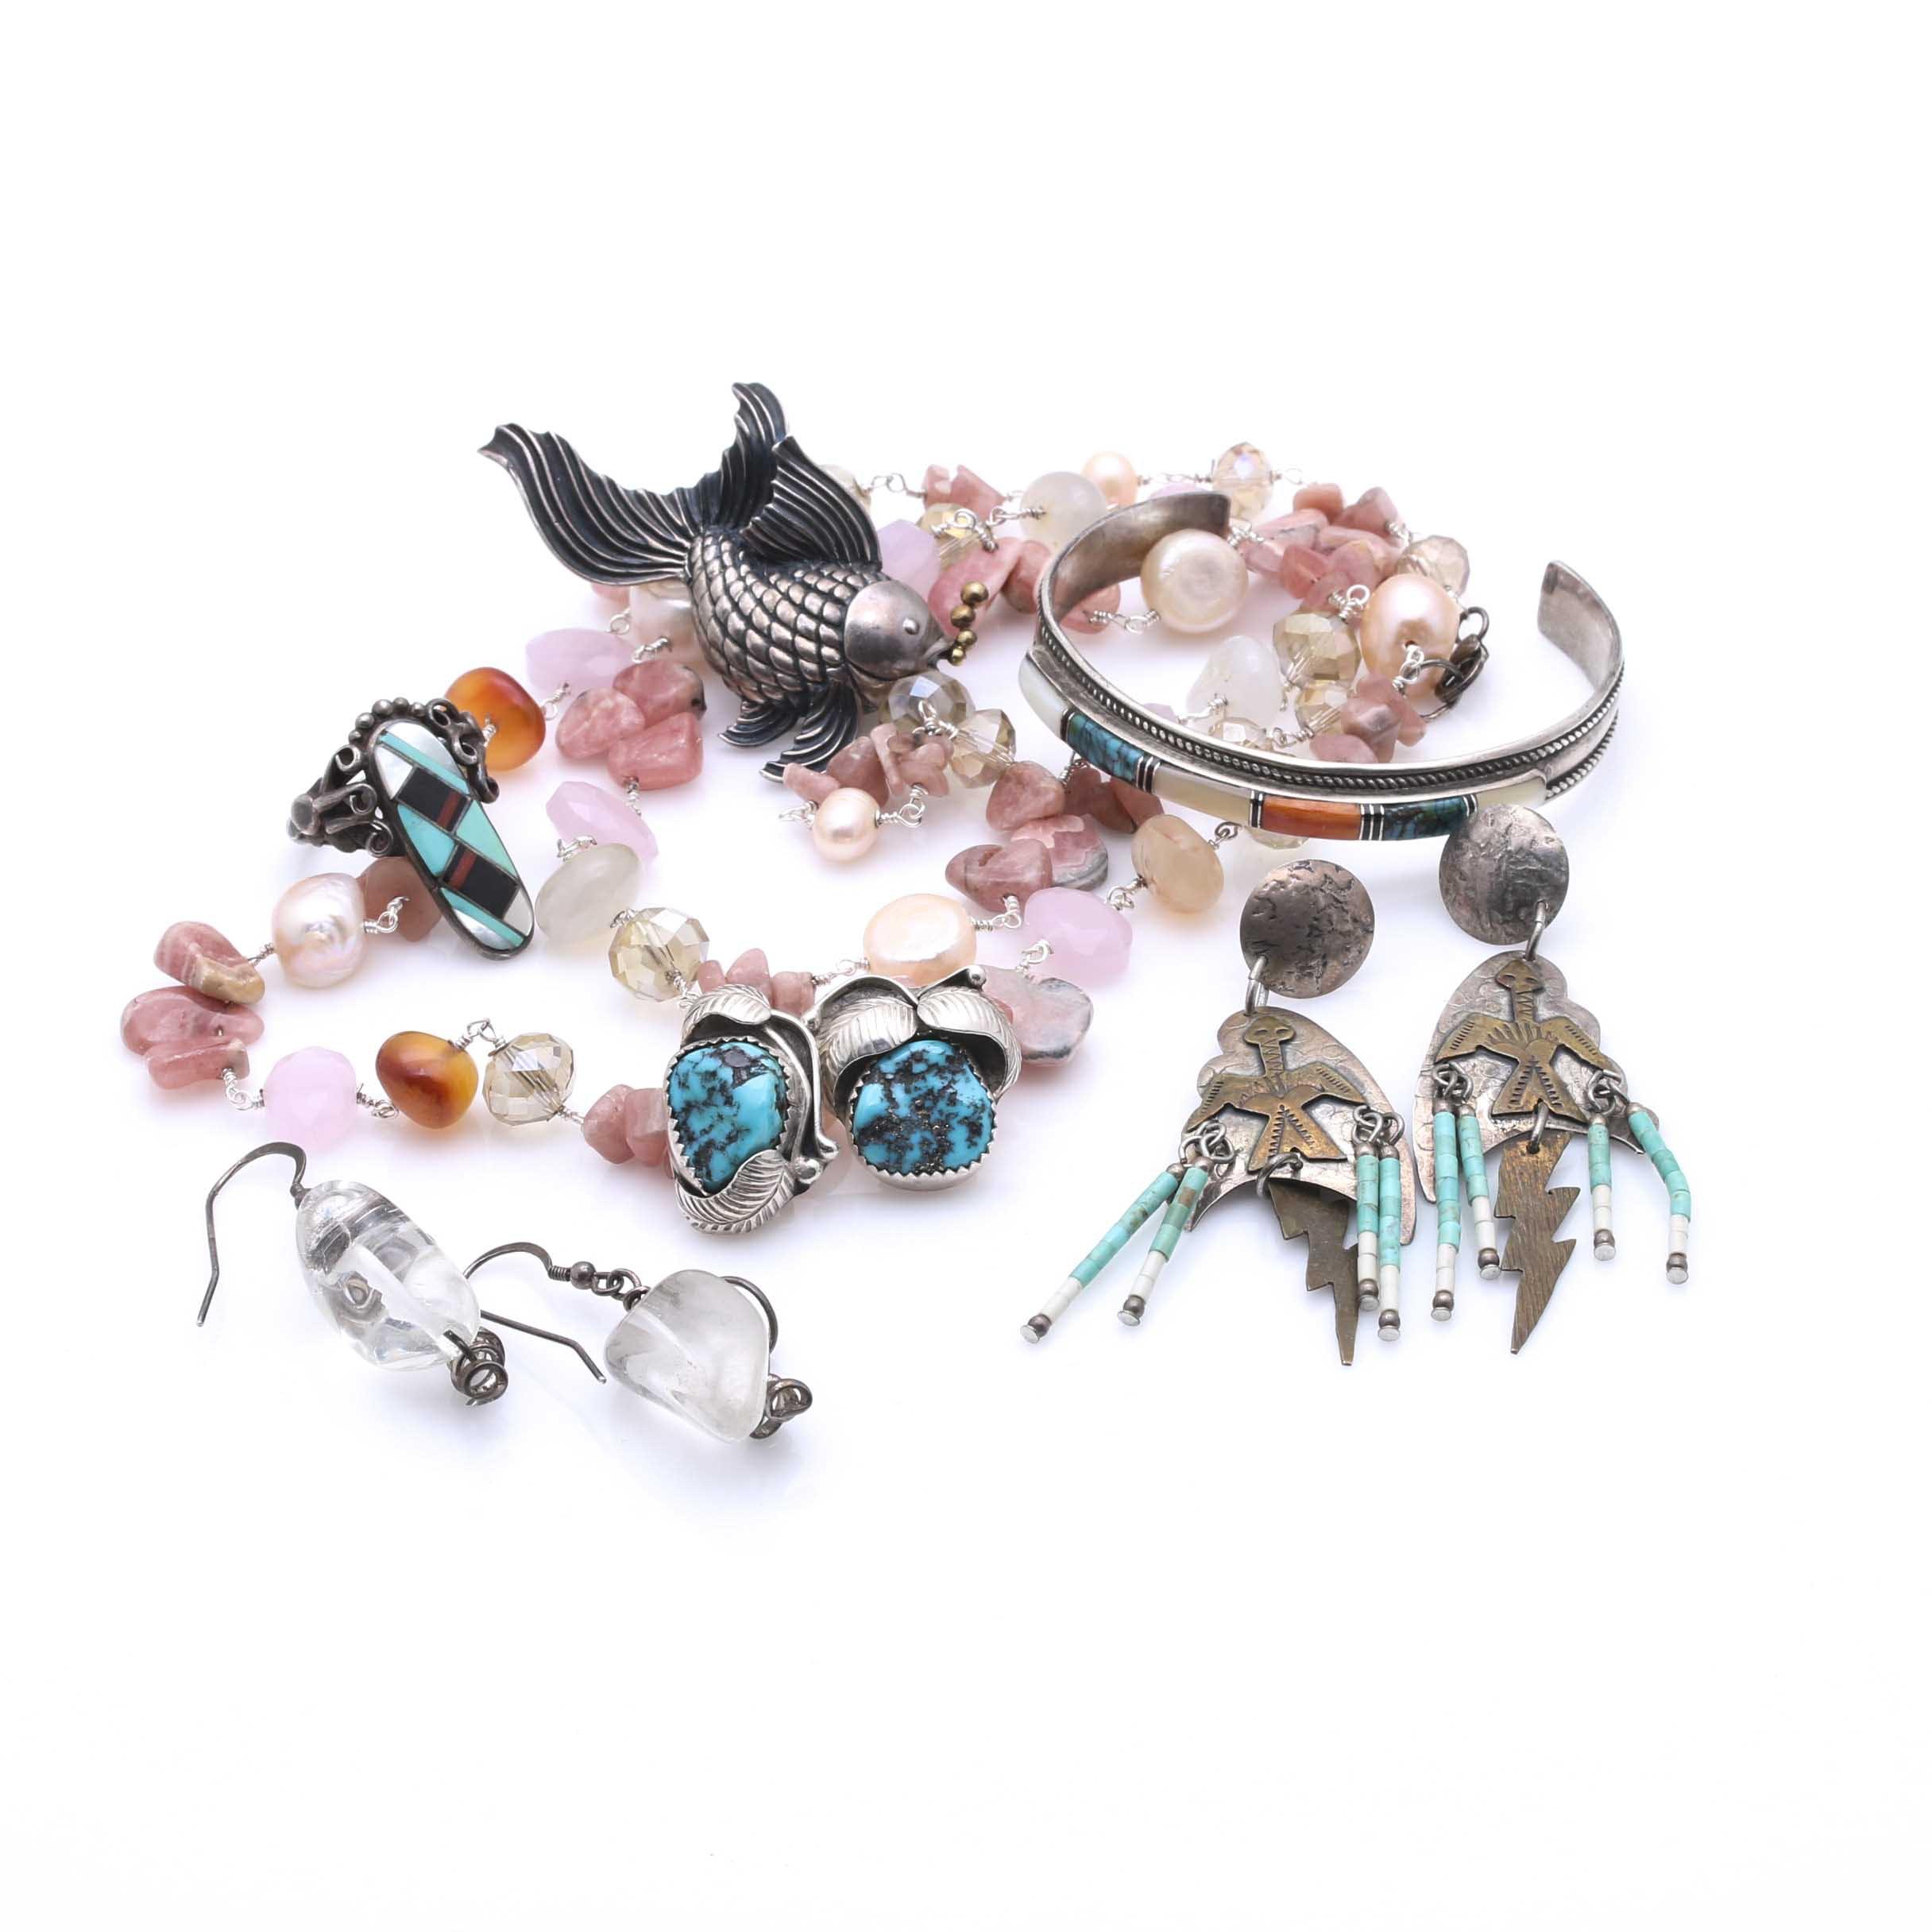 Sterling Silver Gemstone Jewelry Assortment